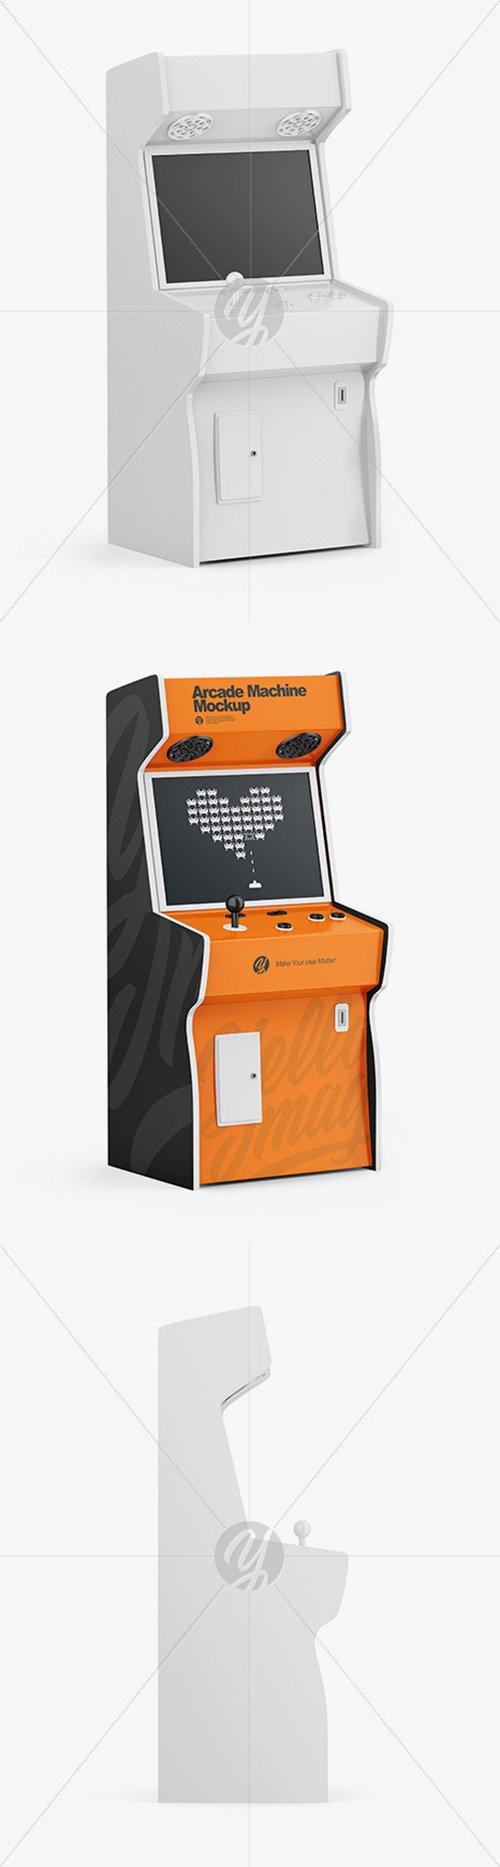 Arcade Machine Mockup 65198